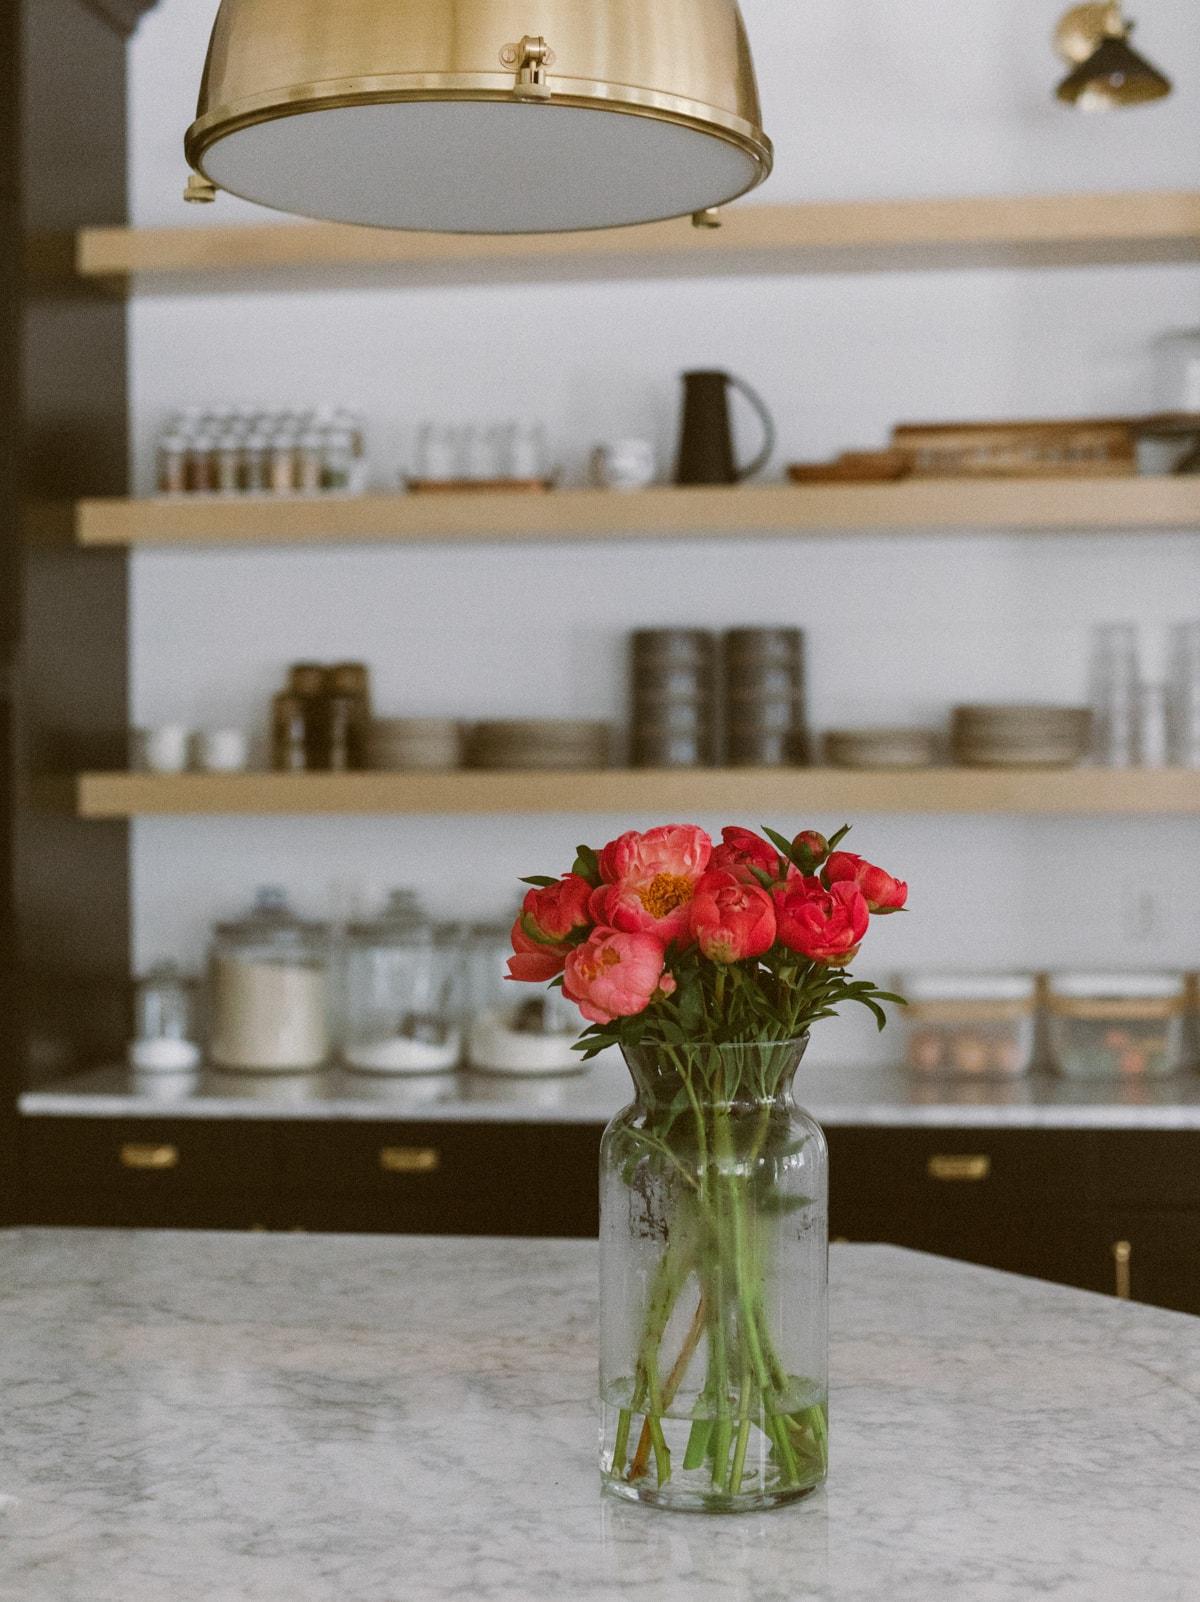 cute glass vase